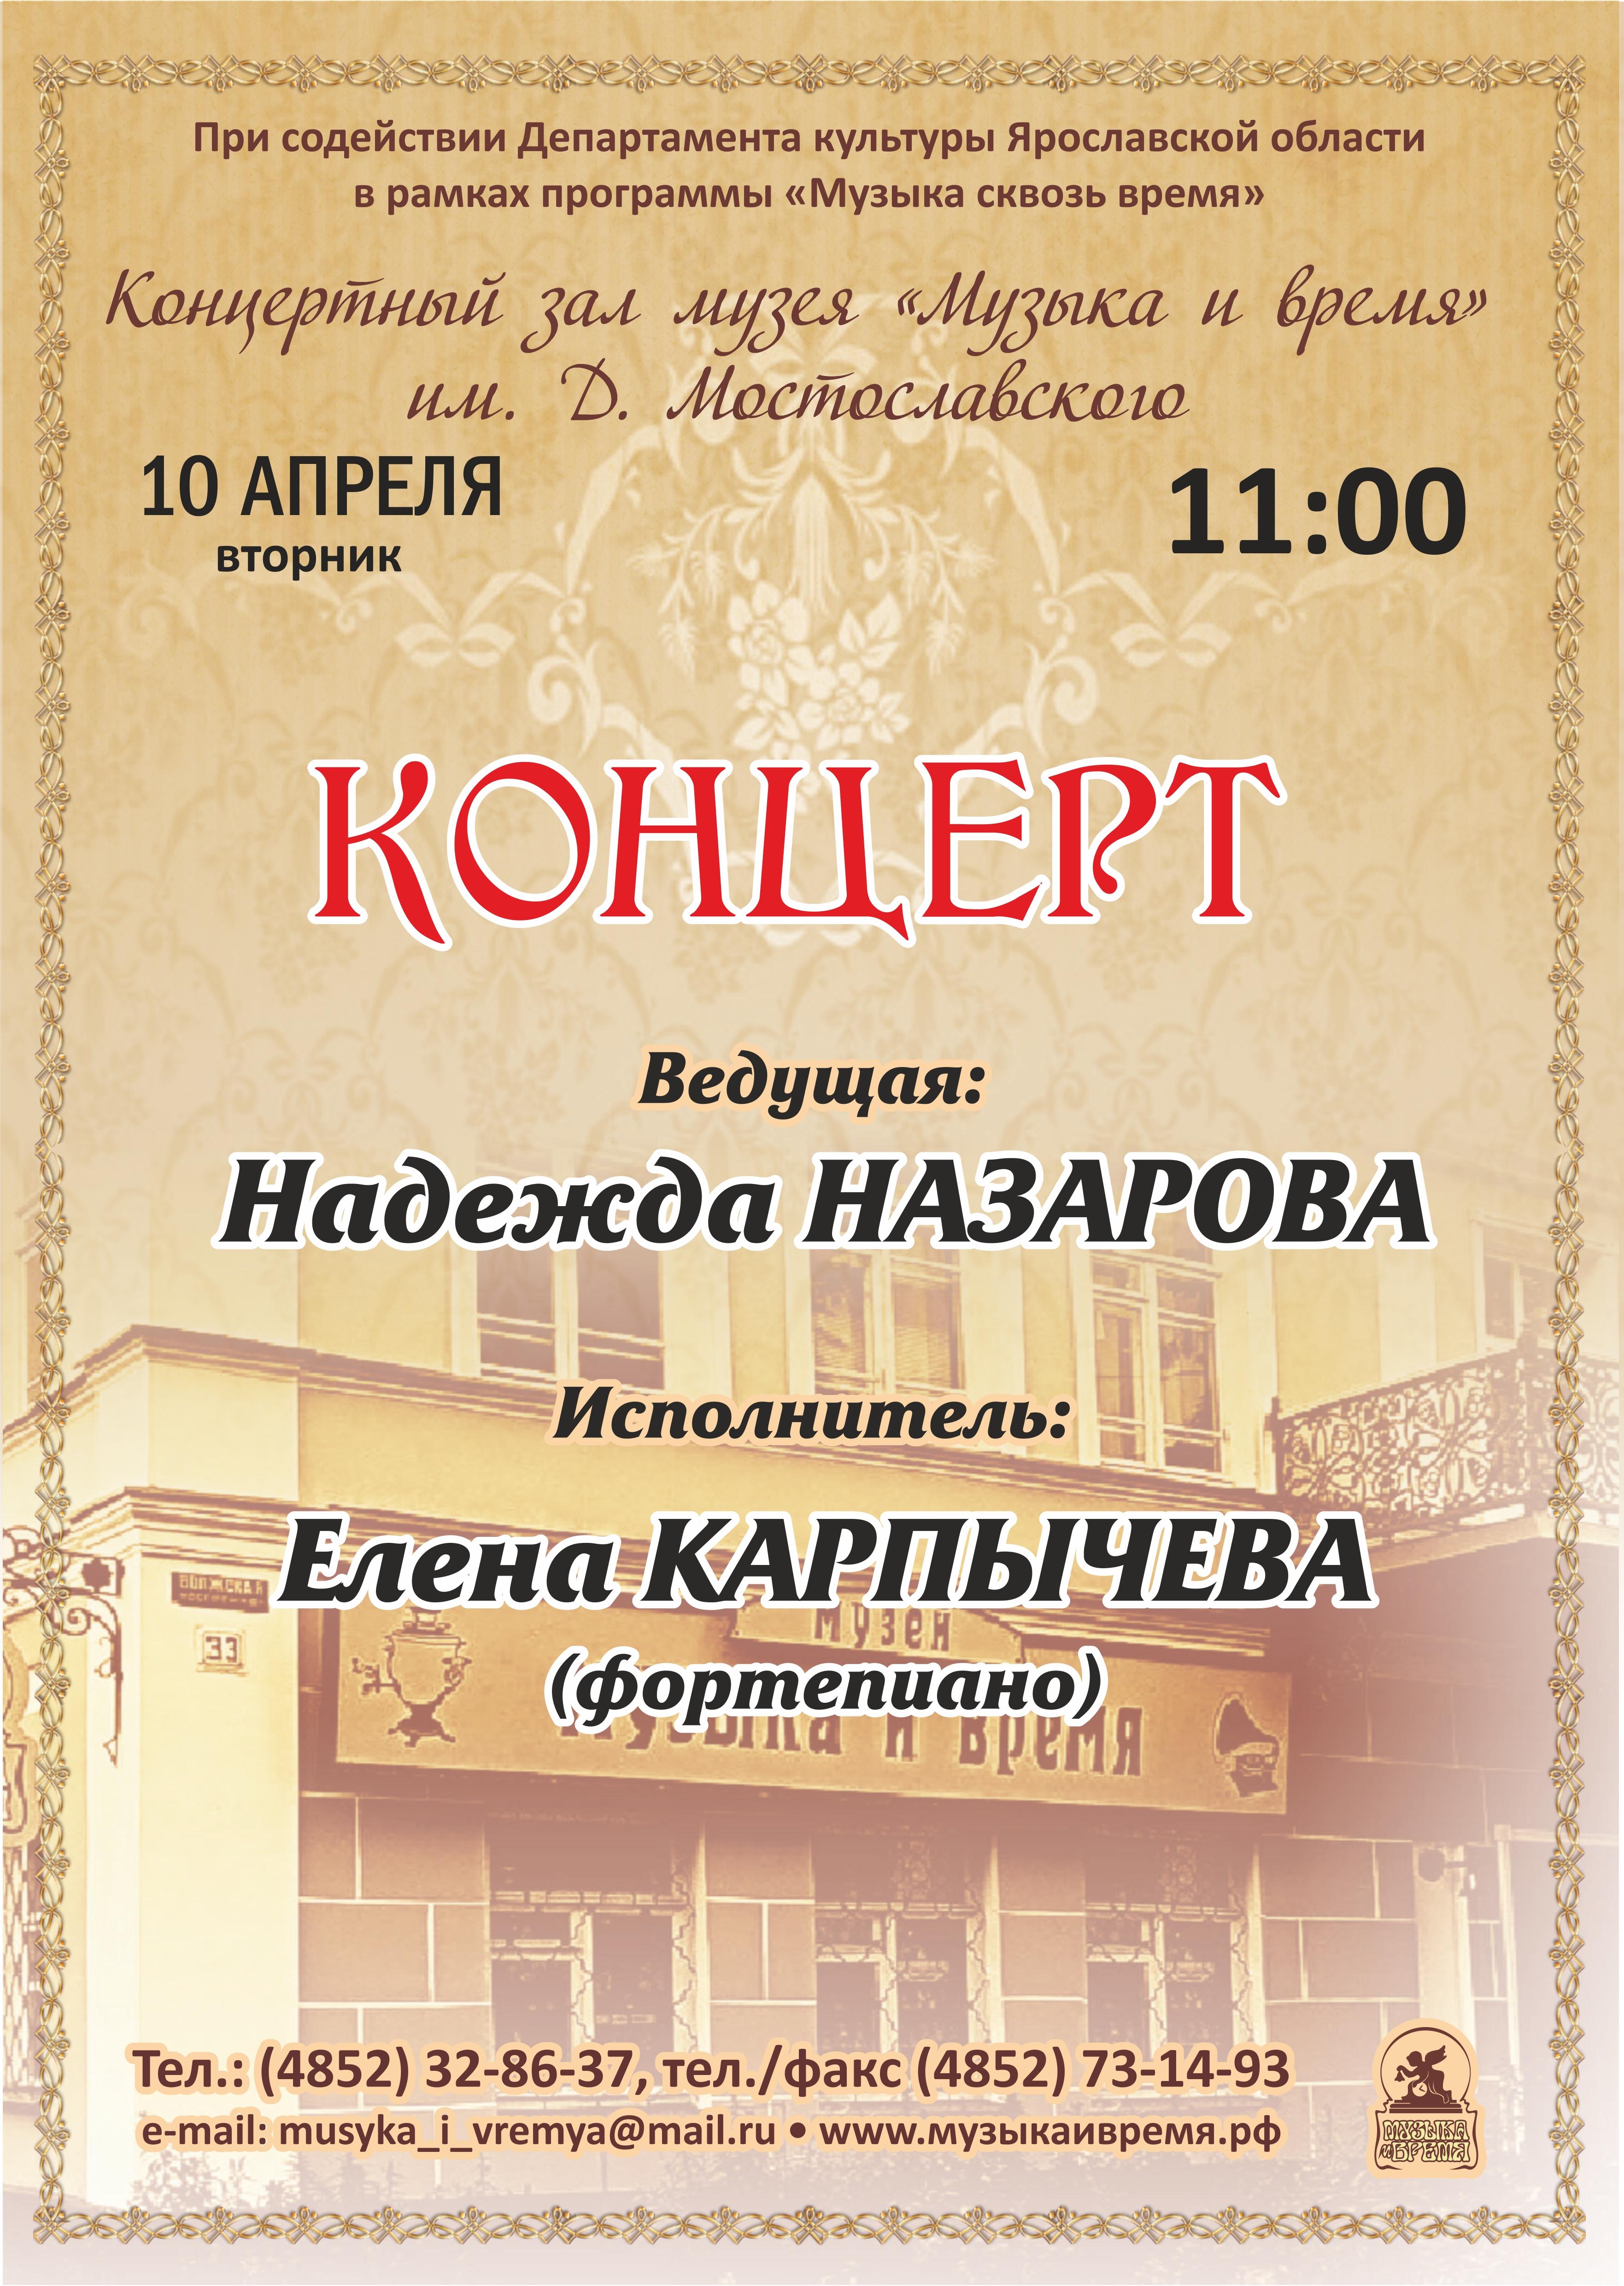 АФИША-апрель-10-1100